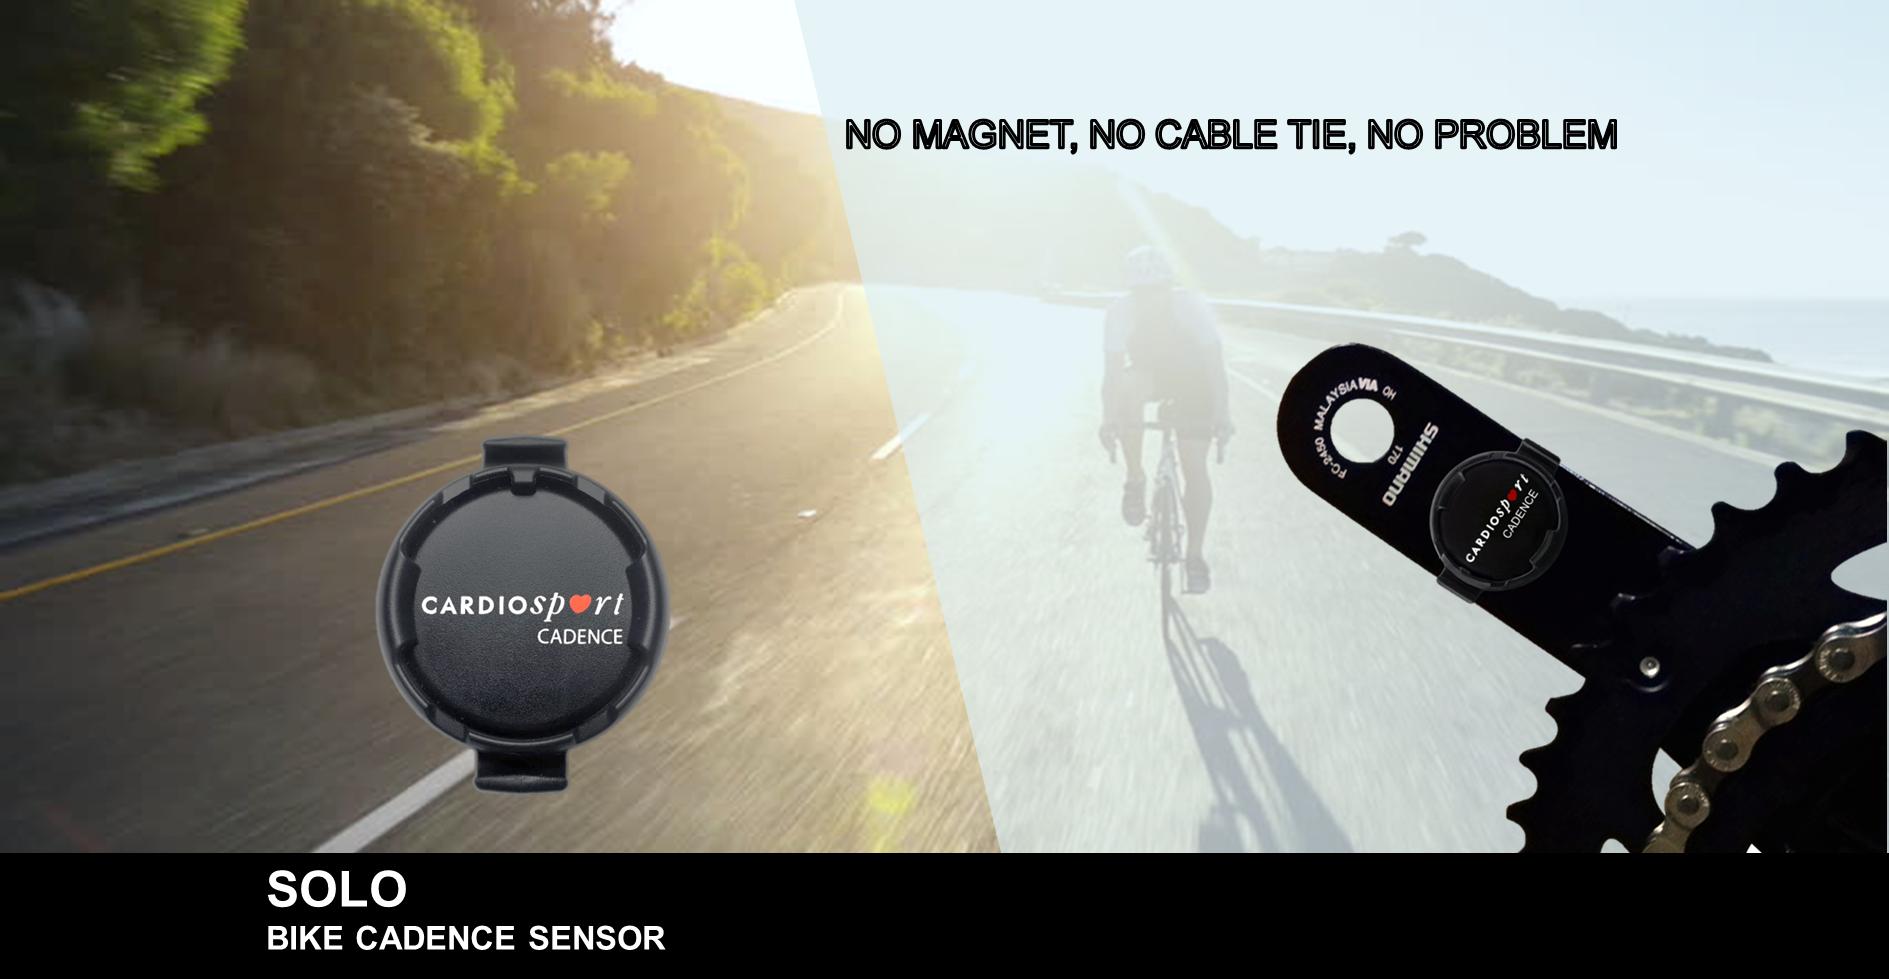 SOLO Bike Cadence Sensor